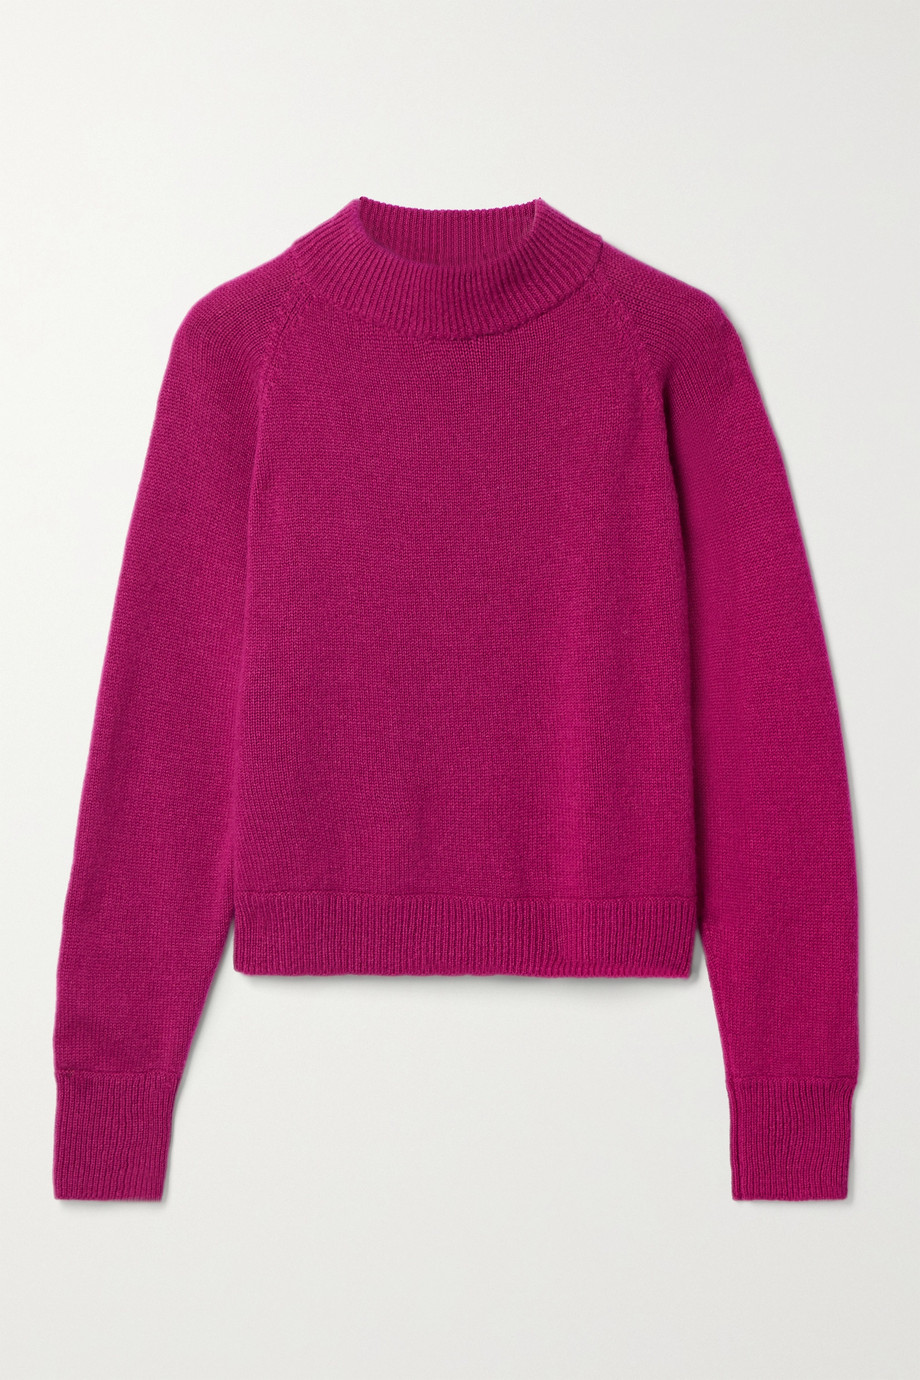 Suzie Kondi Cashmere sweater